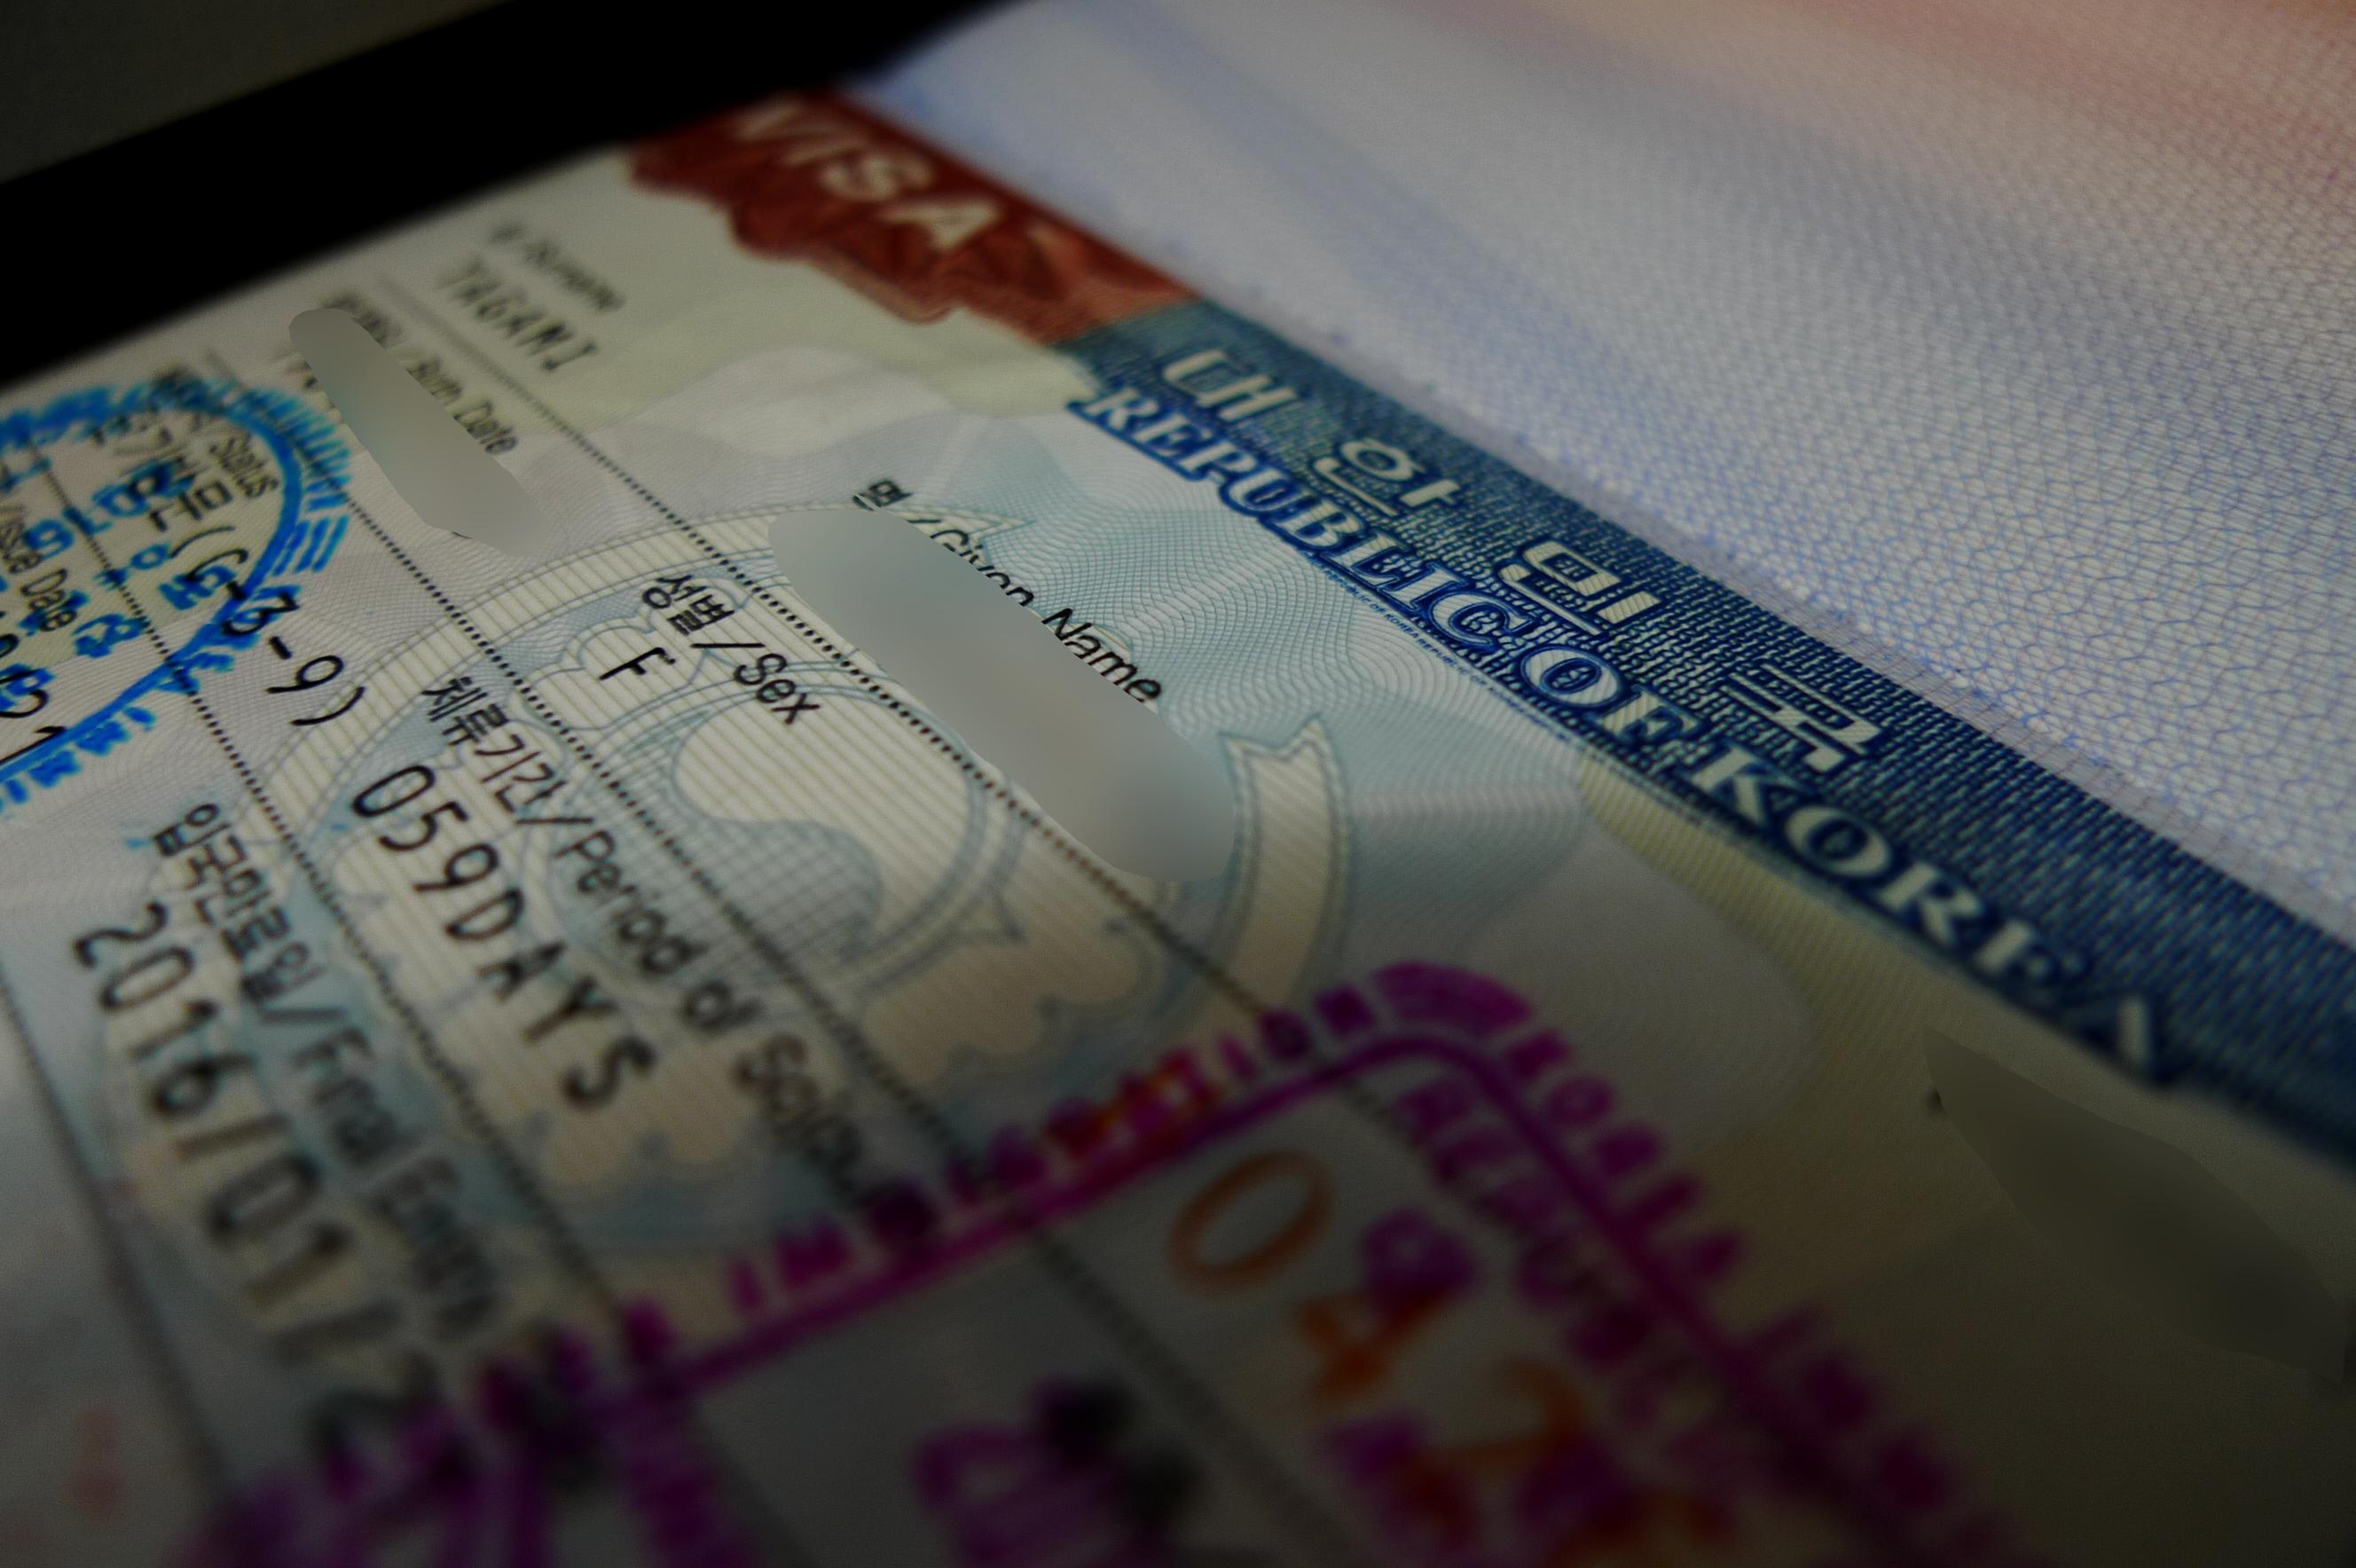 nara visa senior personals To apply for a fiancée visa, follow the steps on the fiancé(e) visa process on usvisasstategov.